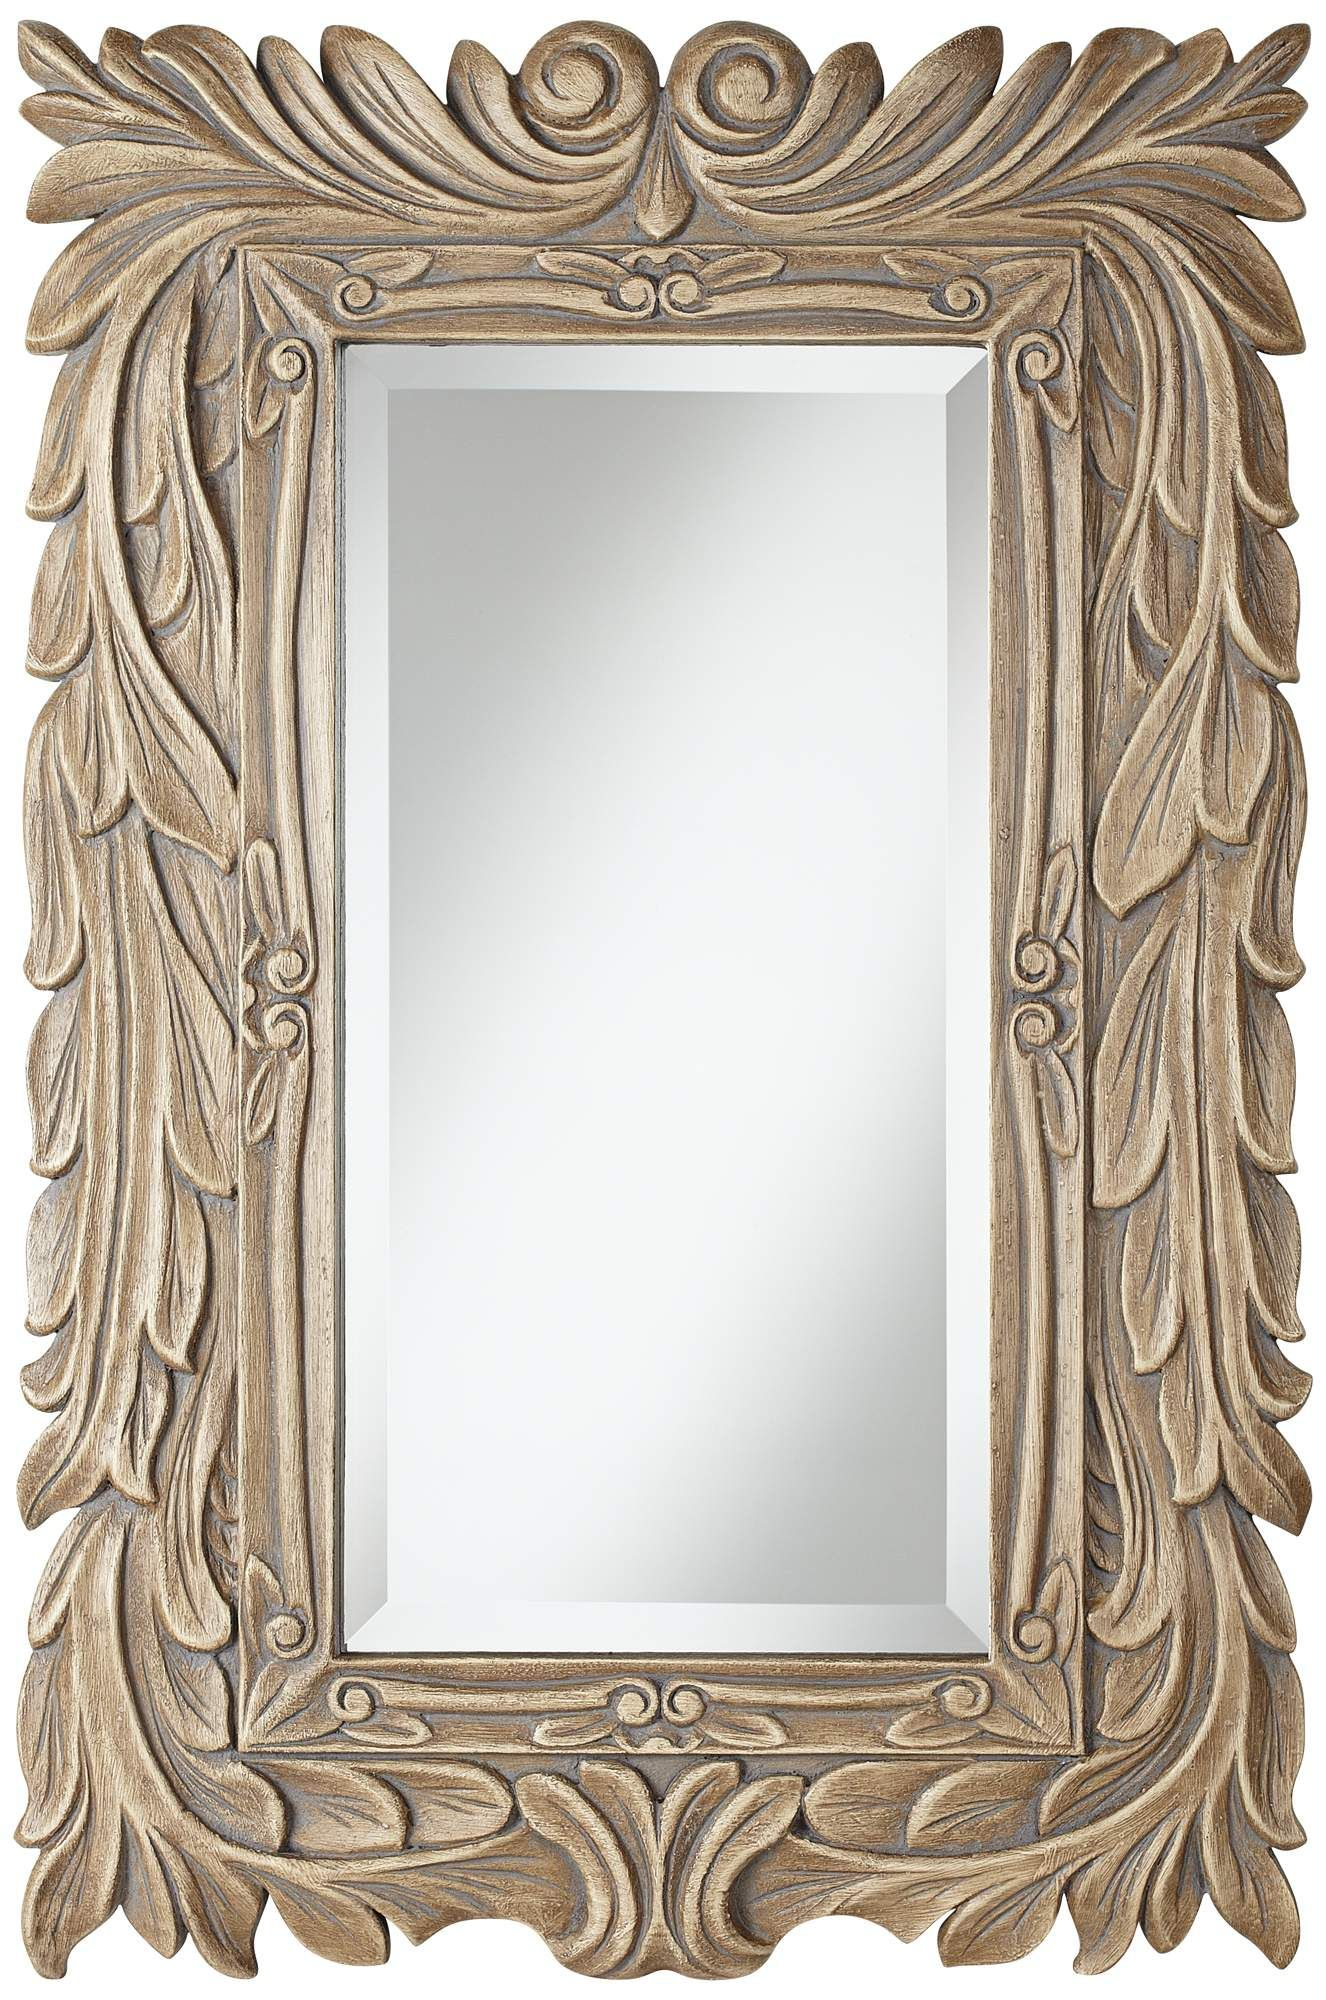 Pin de RICKY ROCKET en Wood things | Pinterest | Tallado en madera ...